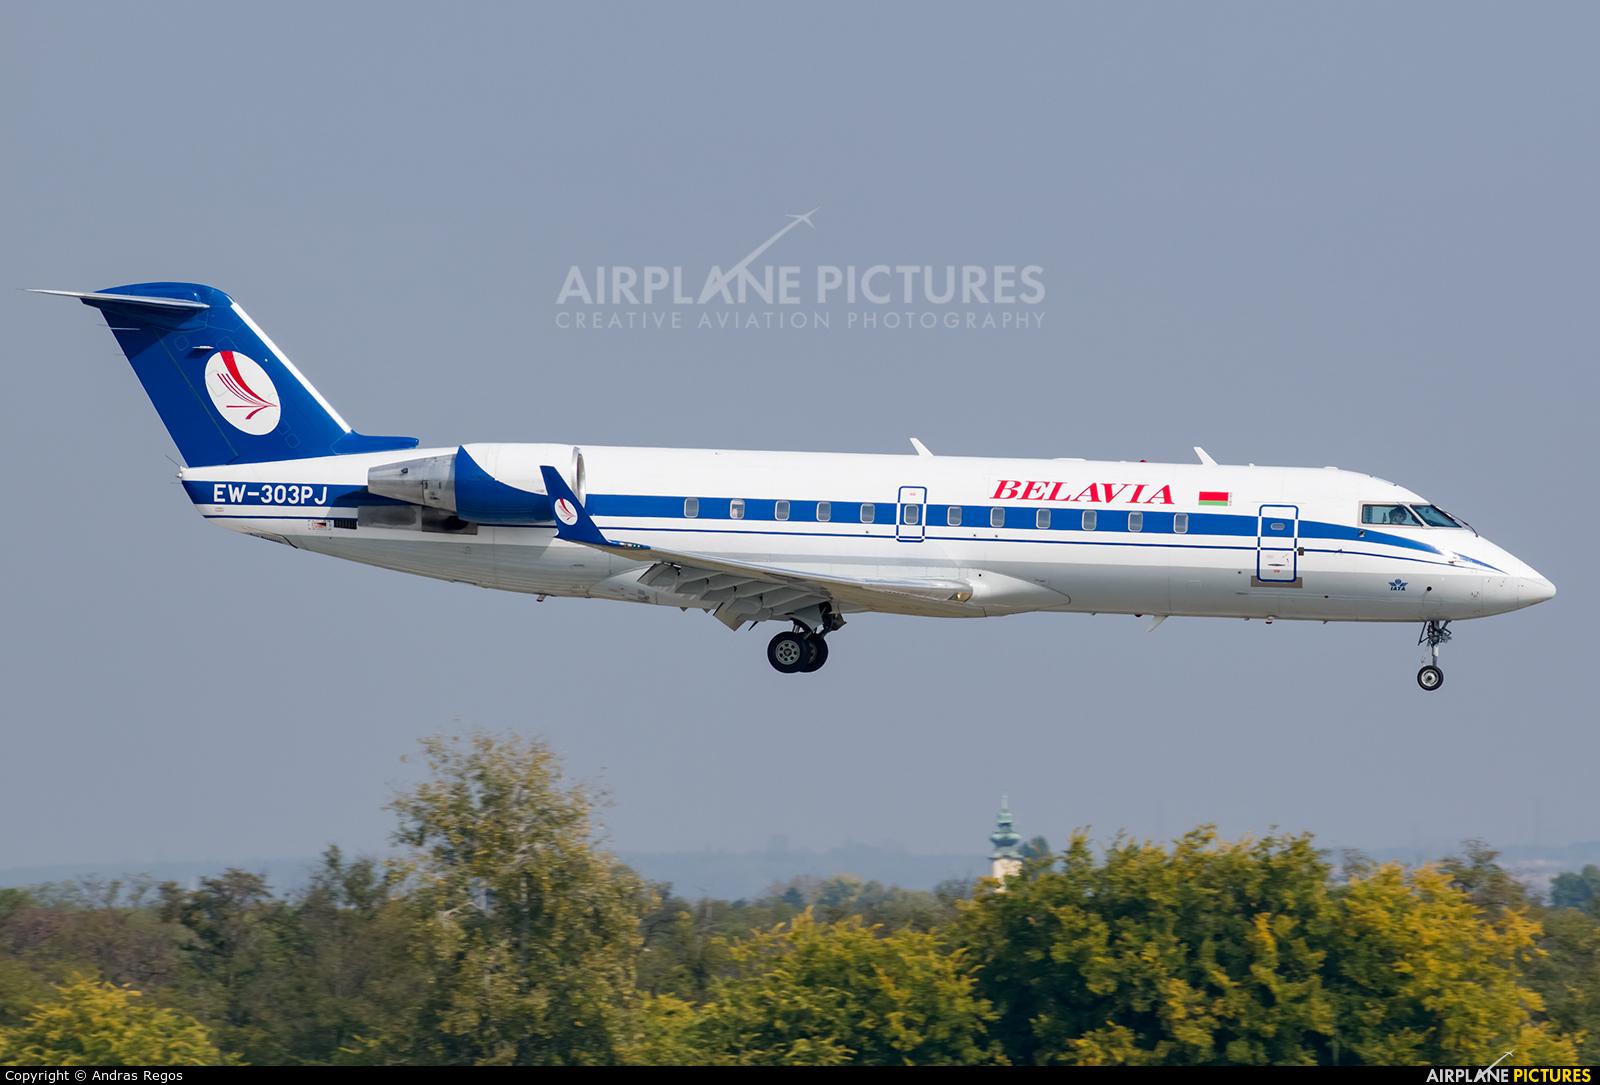 Belavia EW-303PJ aircraft at Budapest Ferenc Liszt International Airport